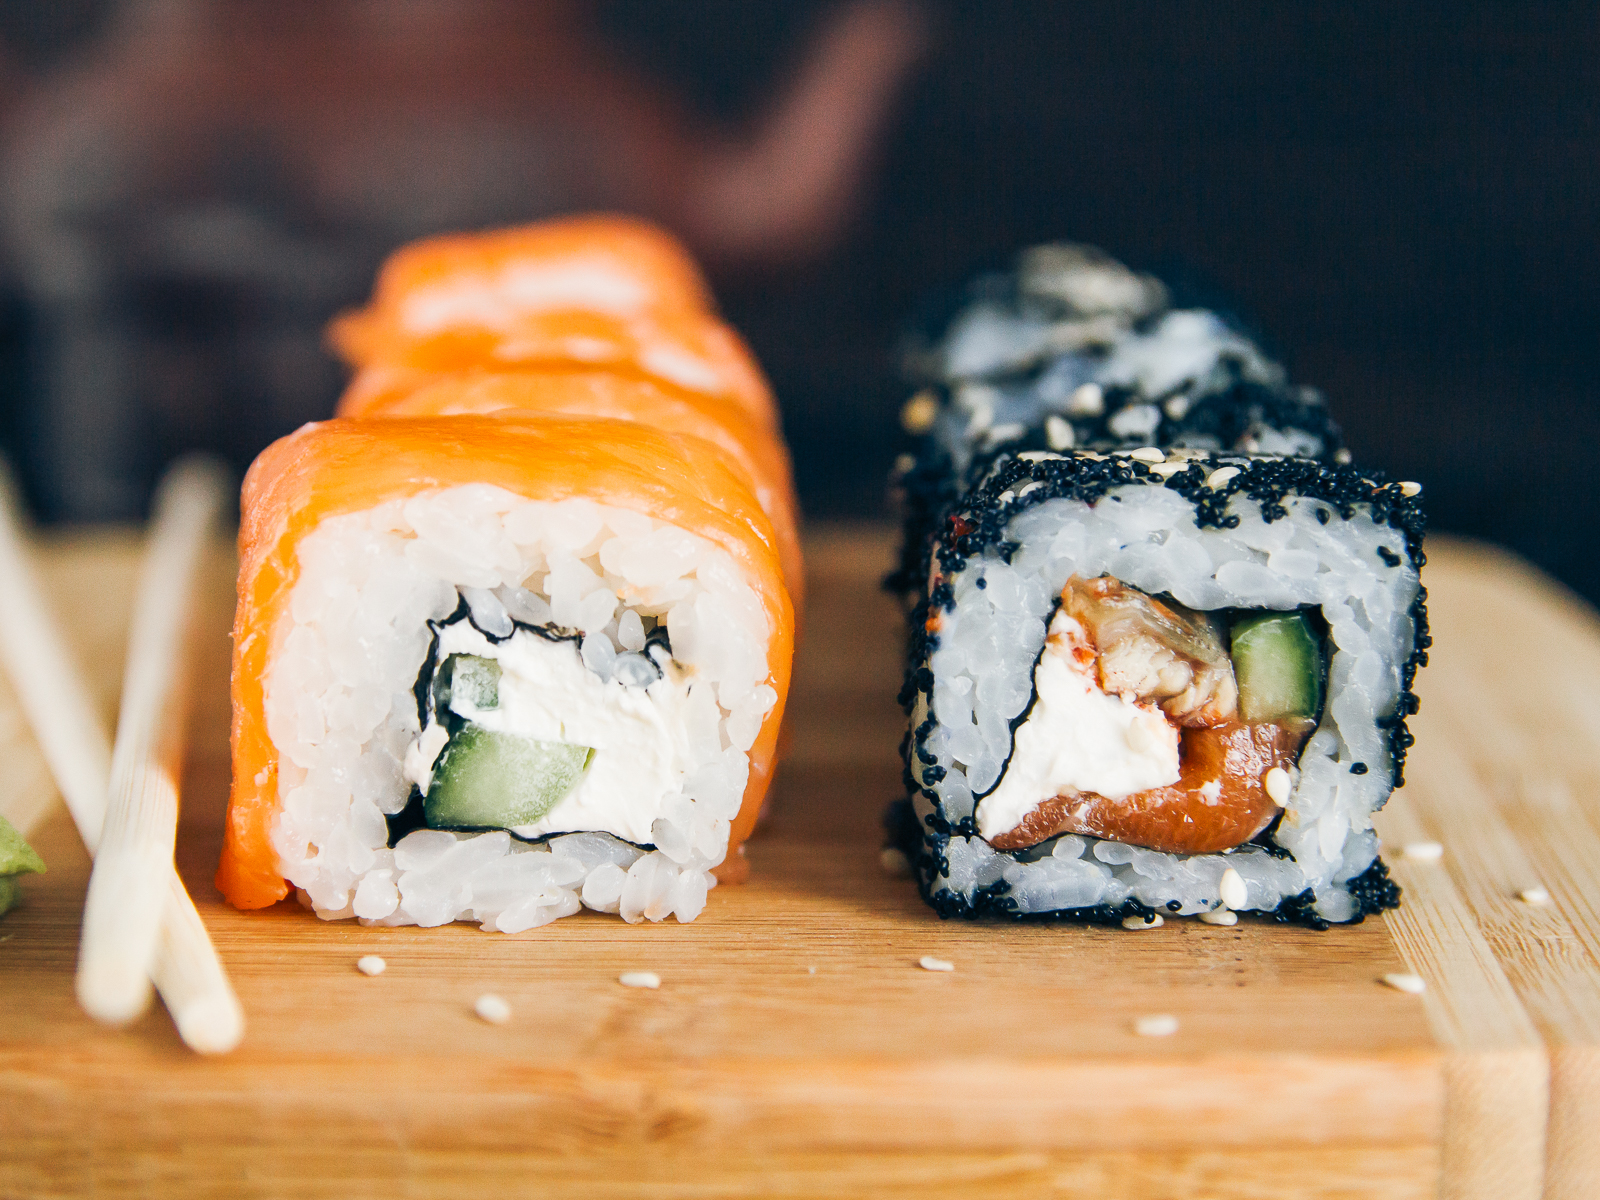 Суши roll 7 самураев